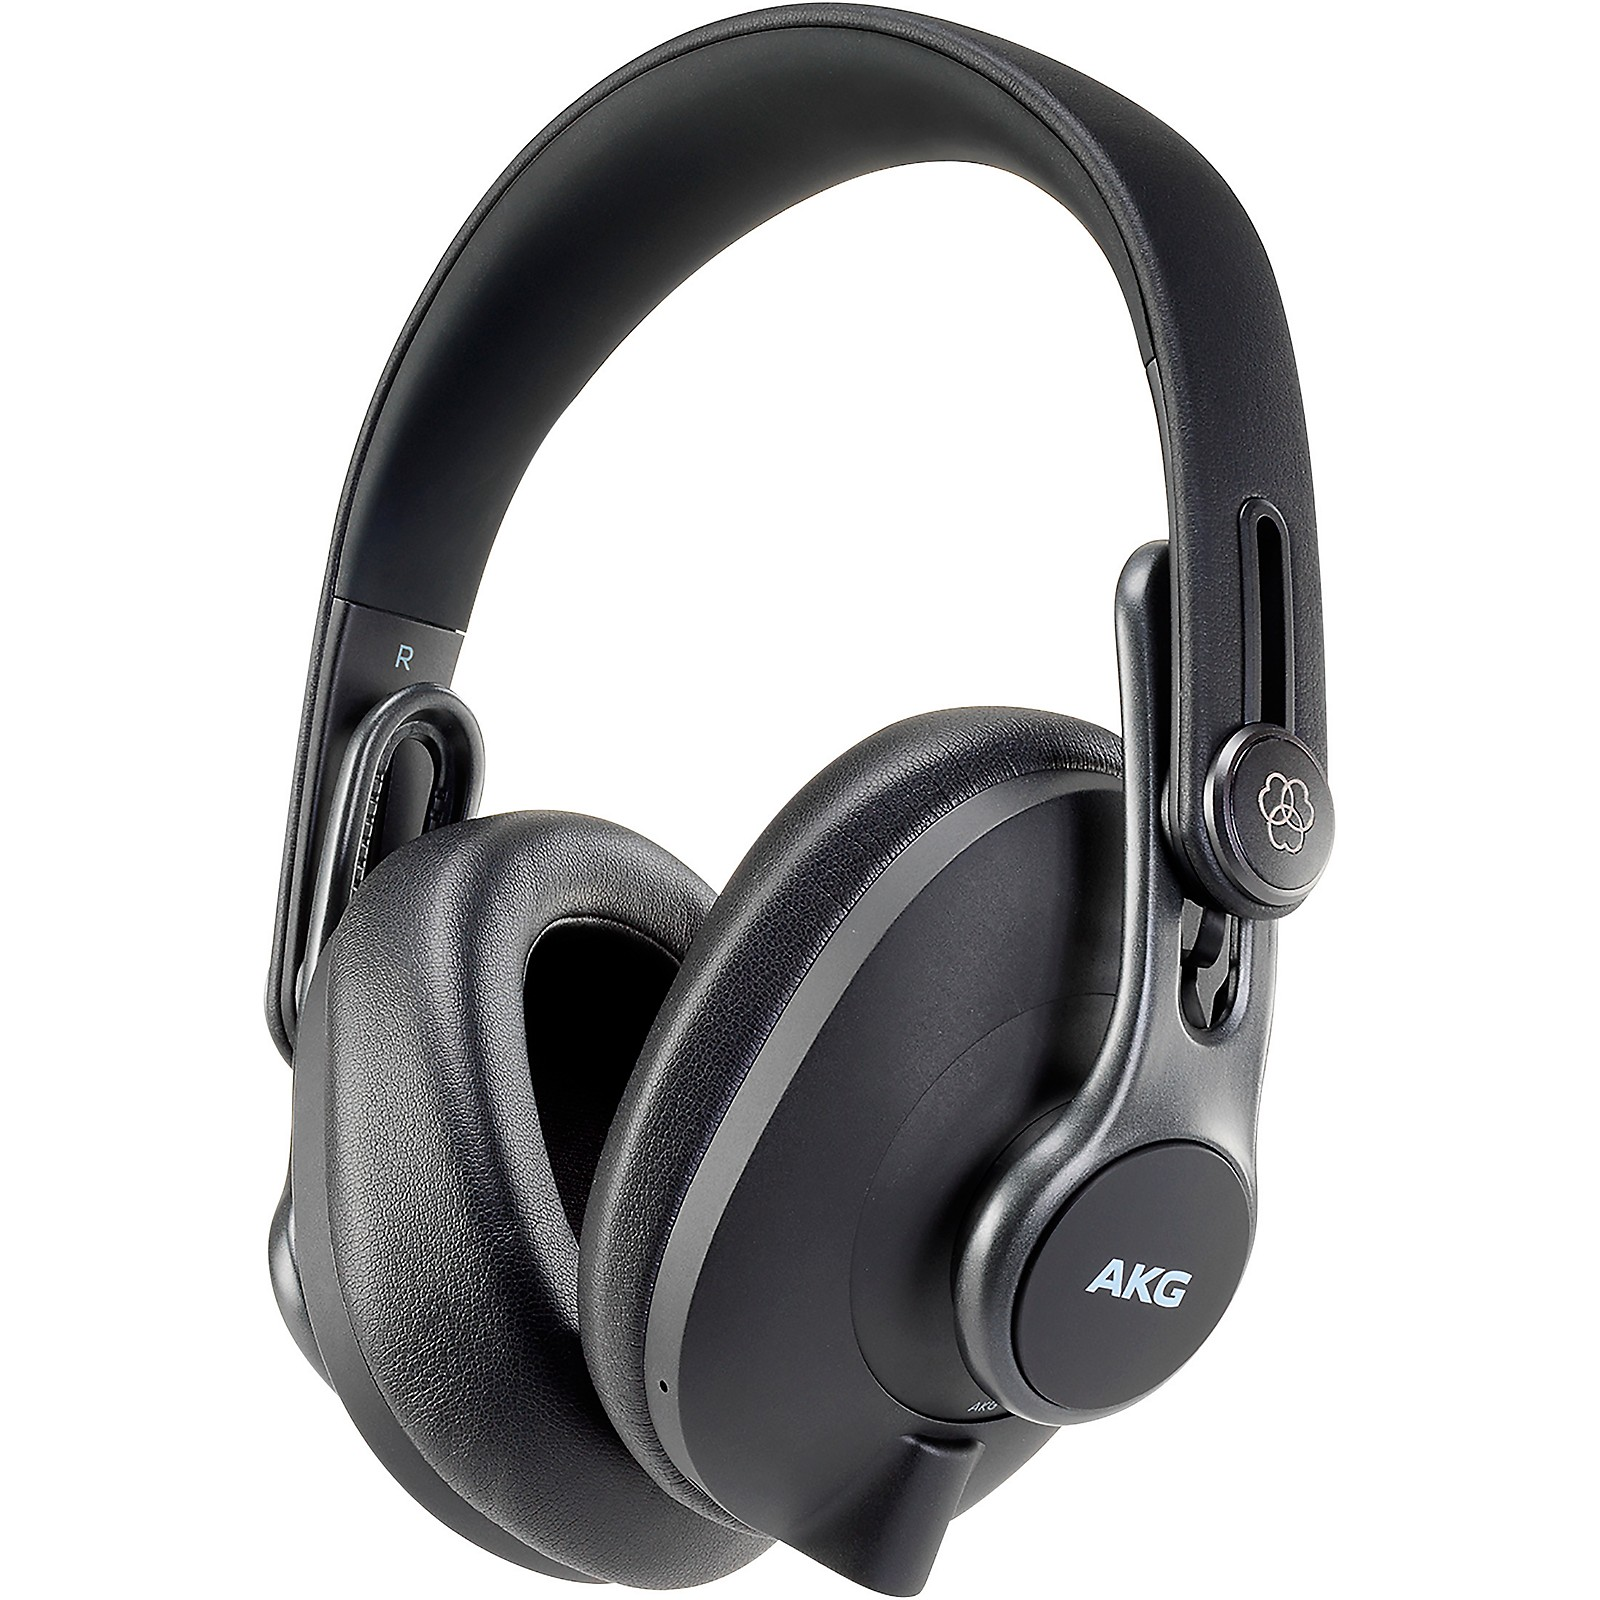 AKG K371-BT Over-Ear, Closed-Back Foldable Studio Headphones with Bluetooth